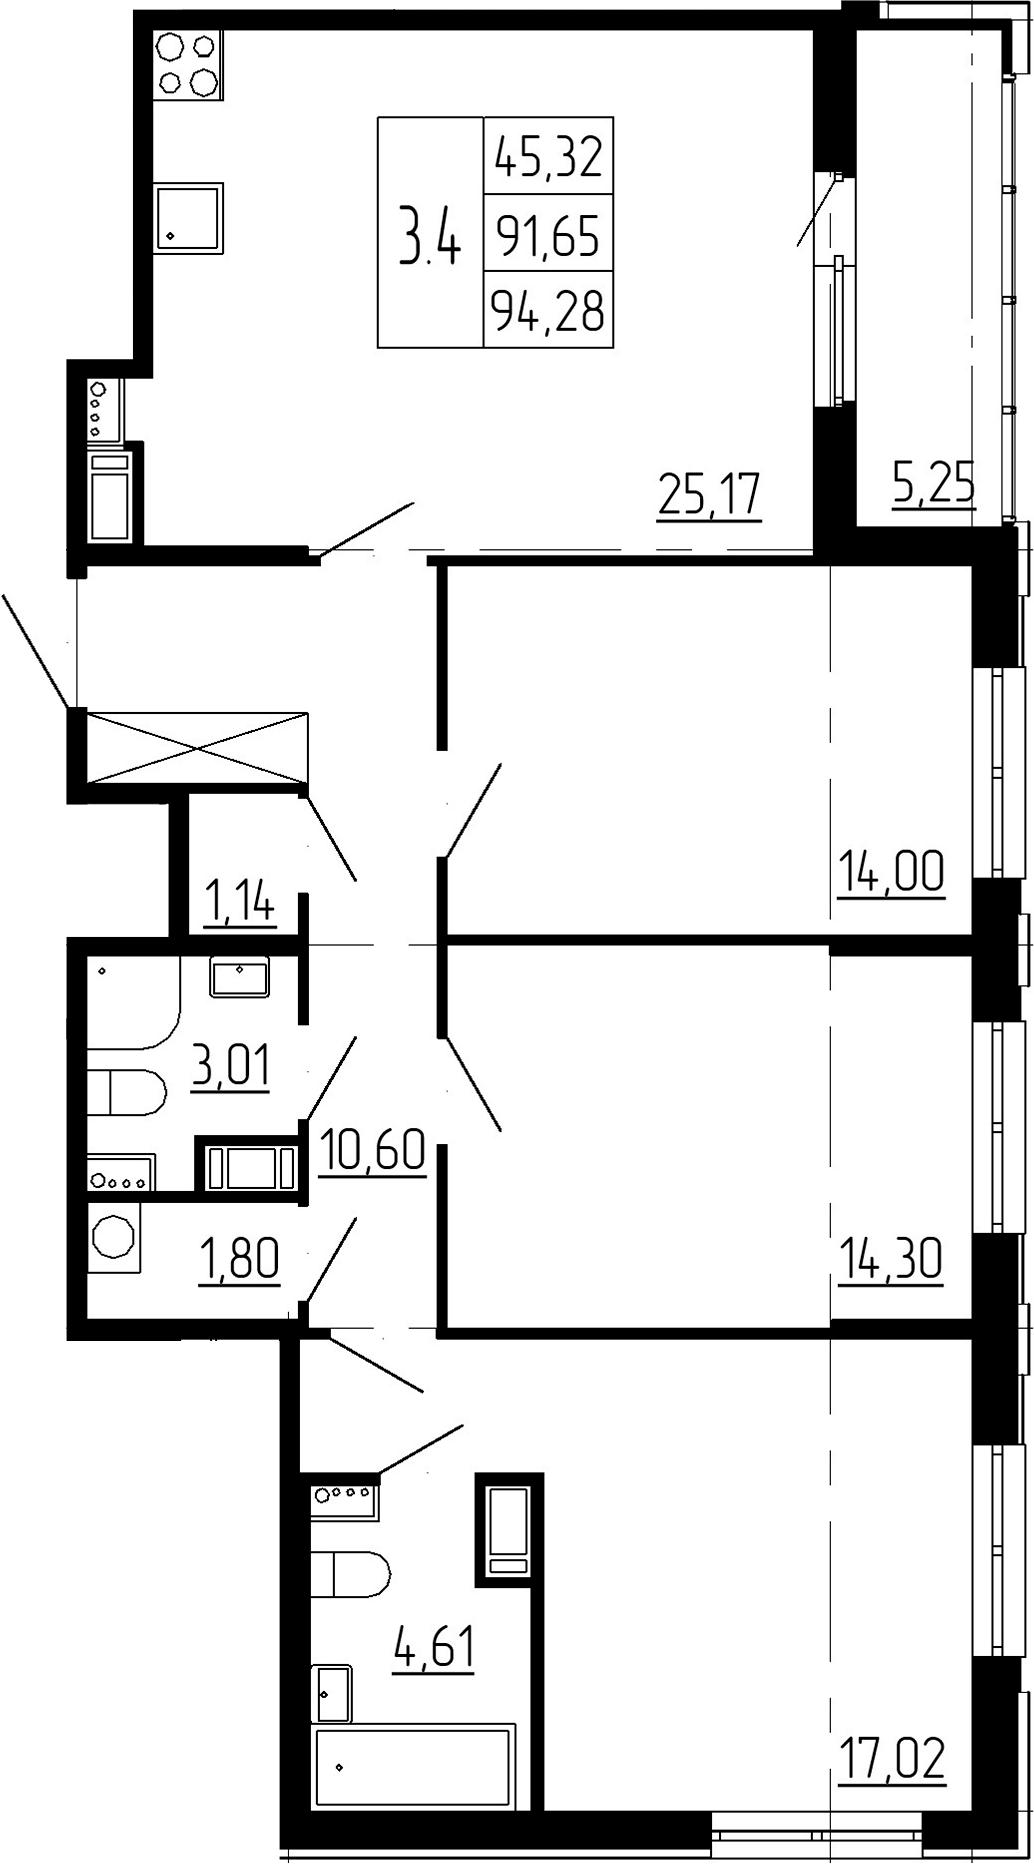 4Е-к.кв, 91.65 м²